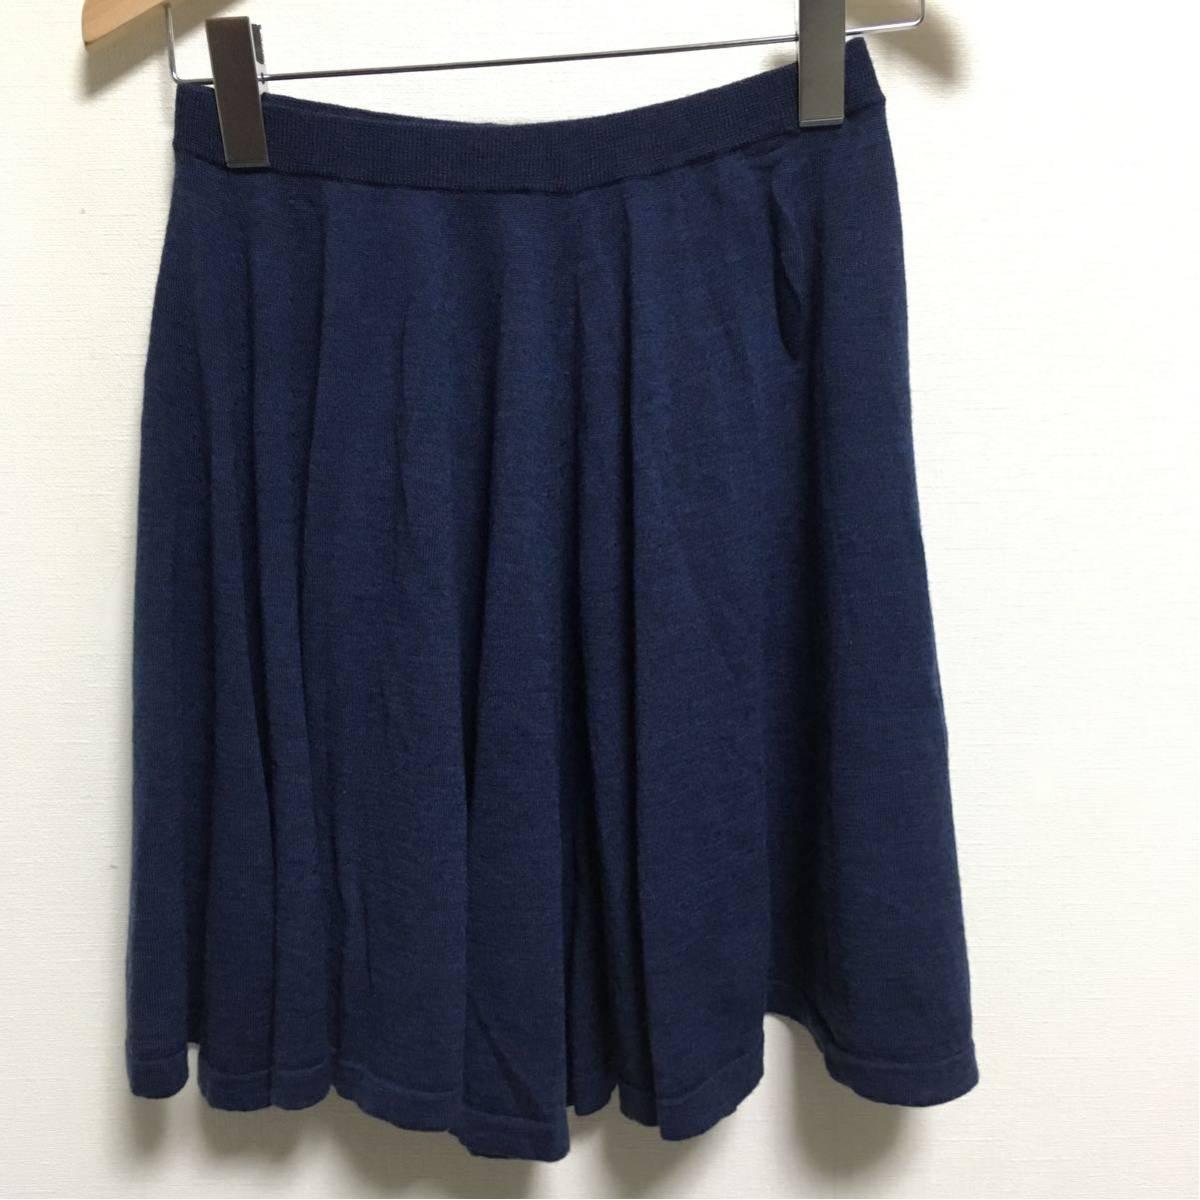 3f8939eb97af5 送料無料 8100 ロンハーマン Ron Herman ニットスカート size:XS ネイビー ウール100%